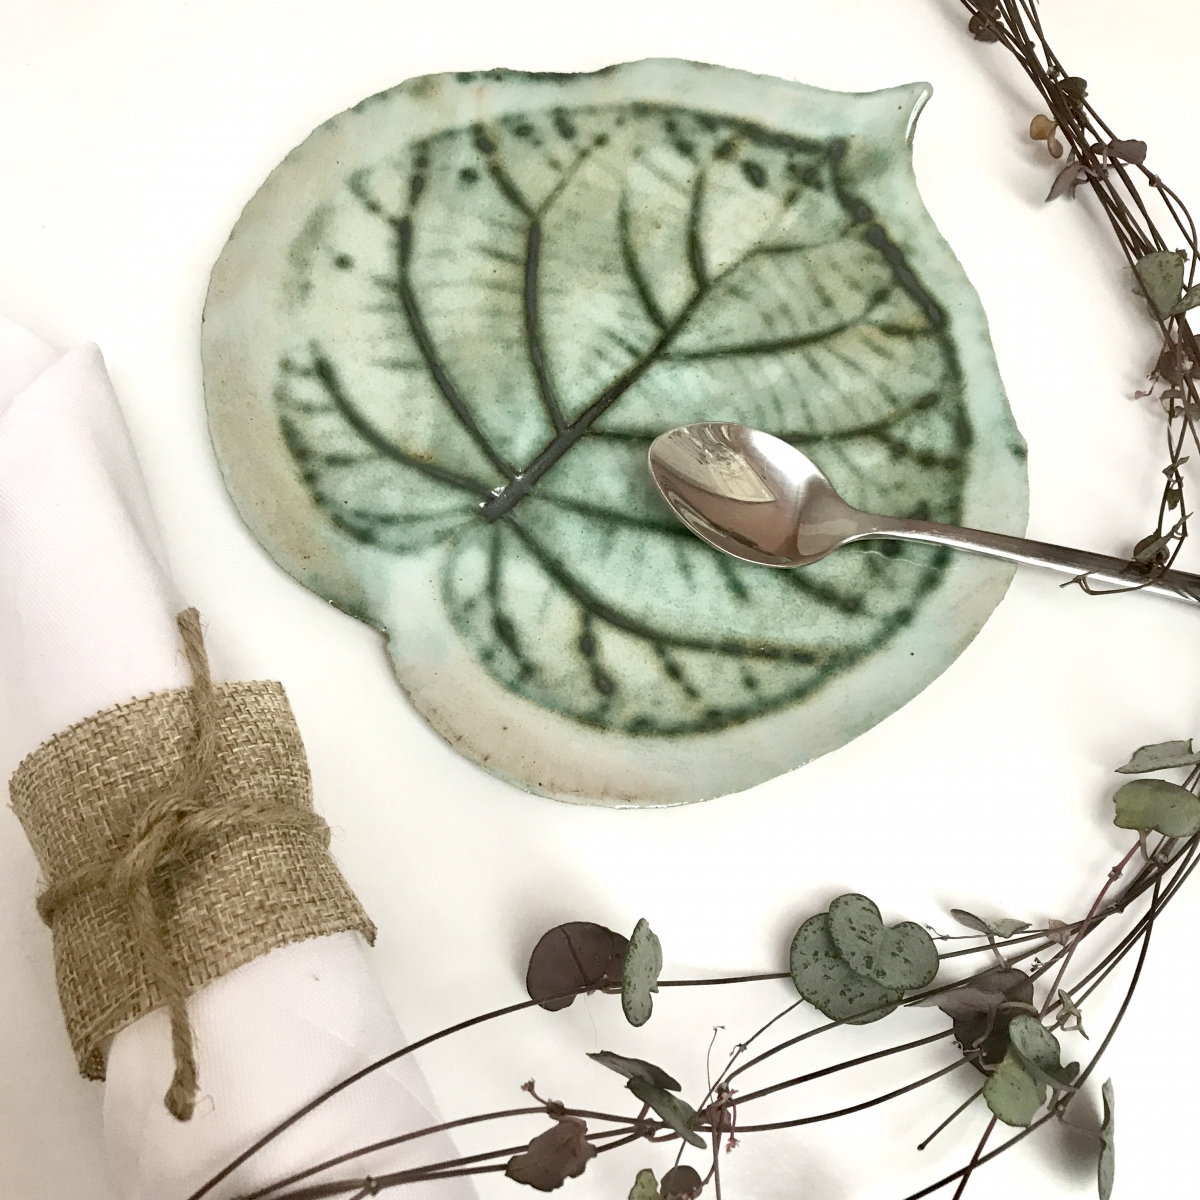 Kiwi Leaf Side Plate by Sonya Ceramic Art